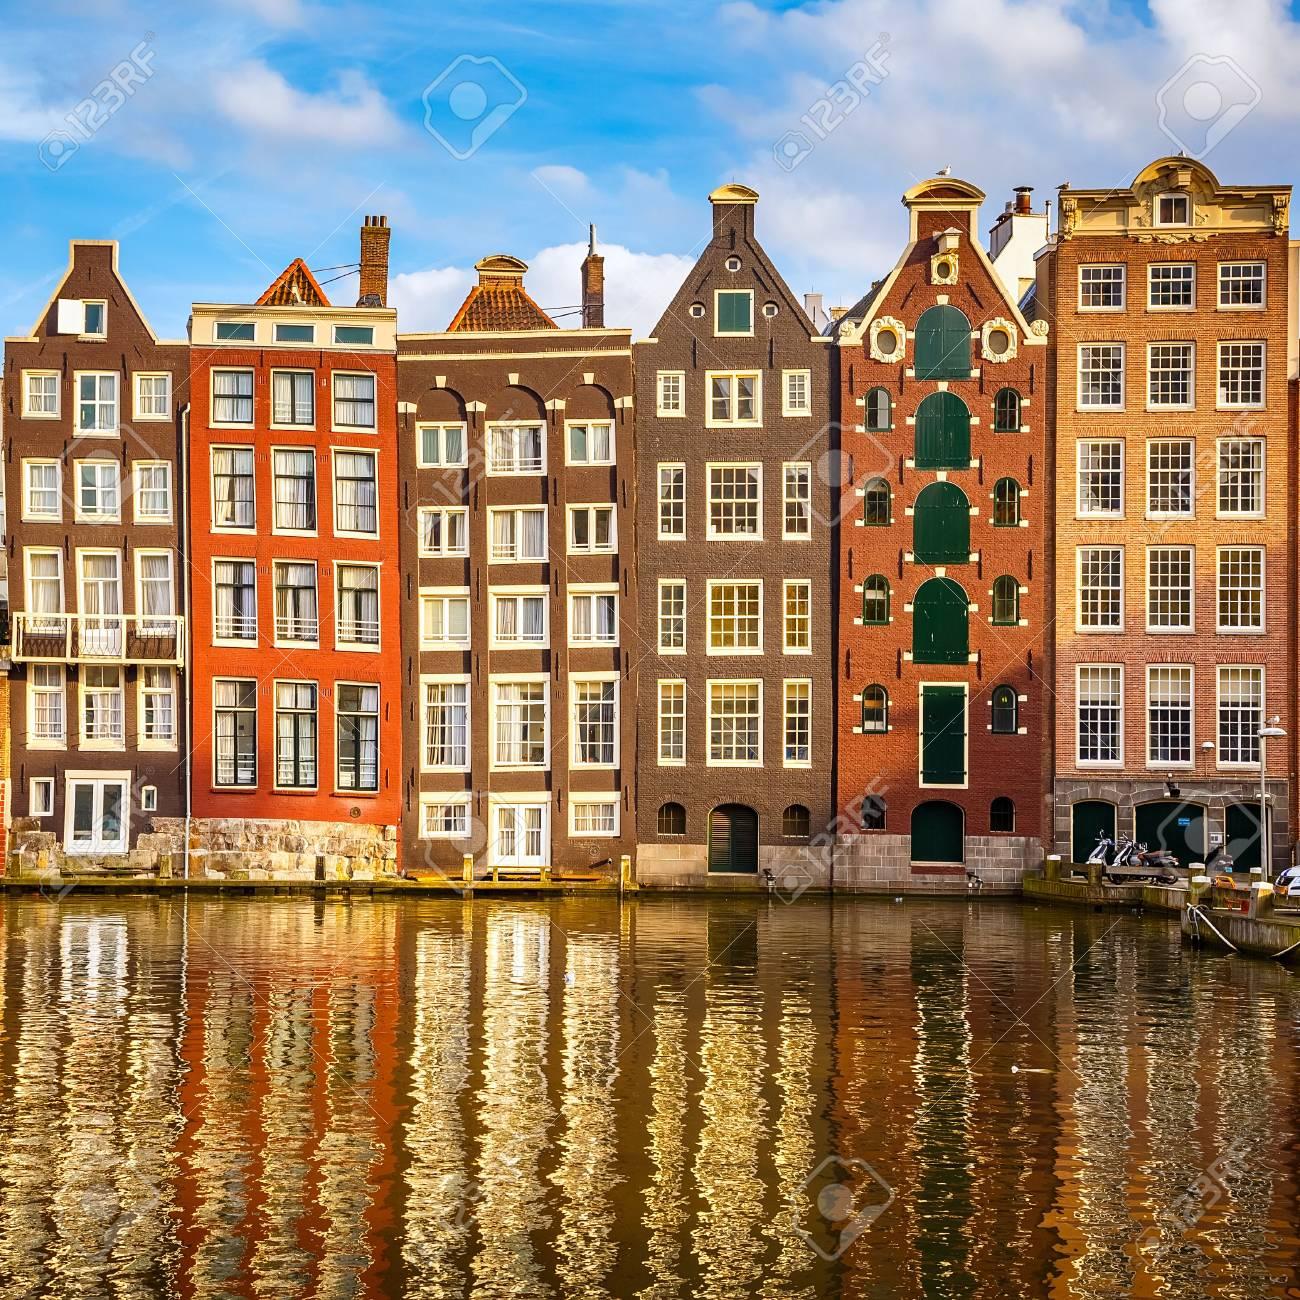 Amsterdam: 4*Eco-Hotel Four Elements - 2 Personen - Doppelzimmer inkl. Parkplatz, Late Check-Out - 24,50€ pP / Gratis Storno /Juli-November